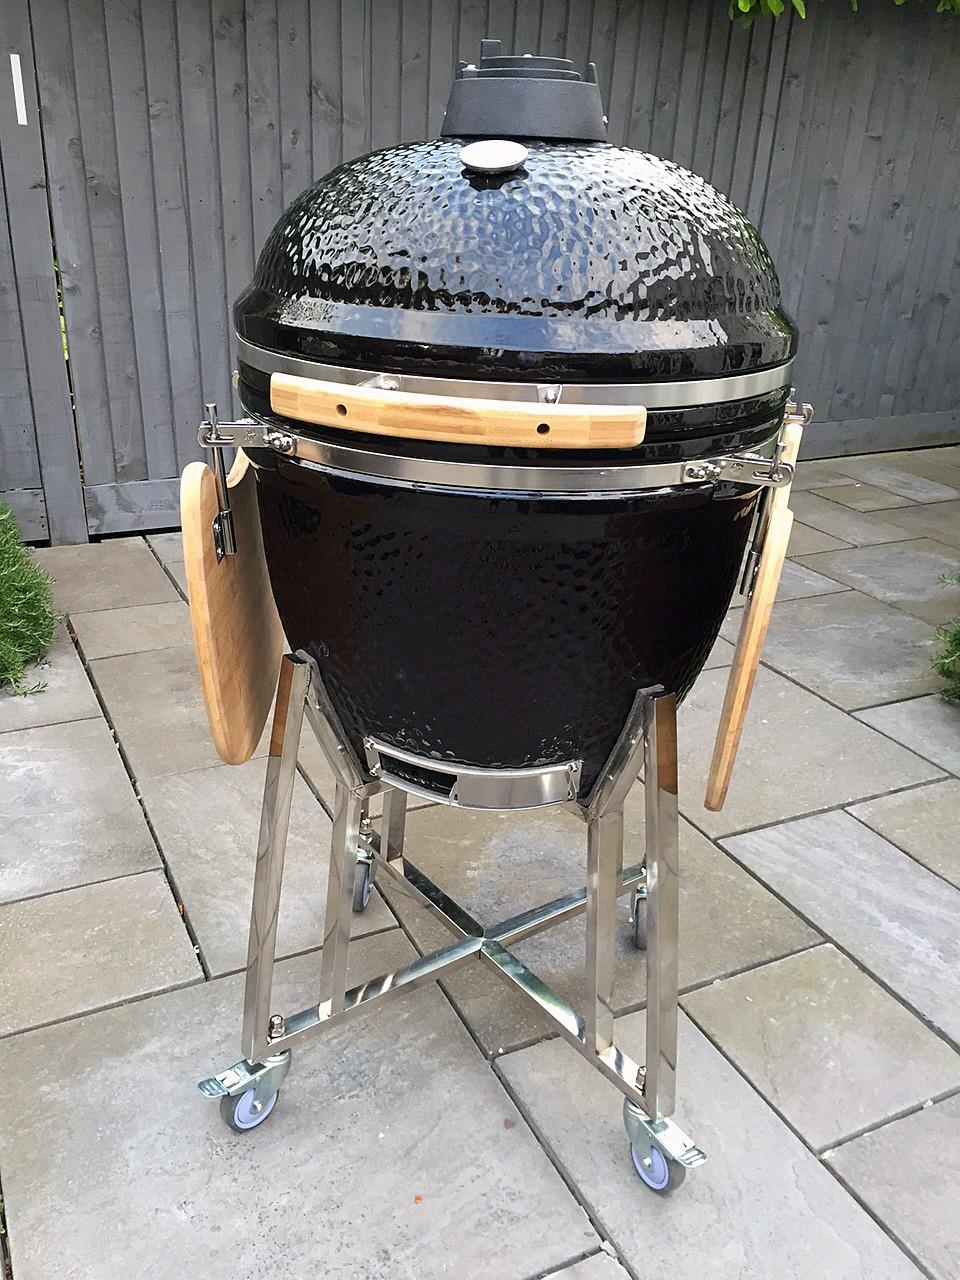 steakstones kamado smoker & grill (ss00ksg) - steakstones